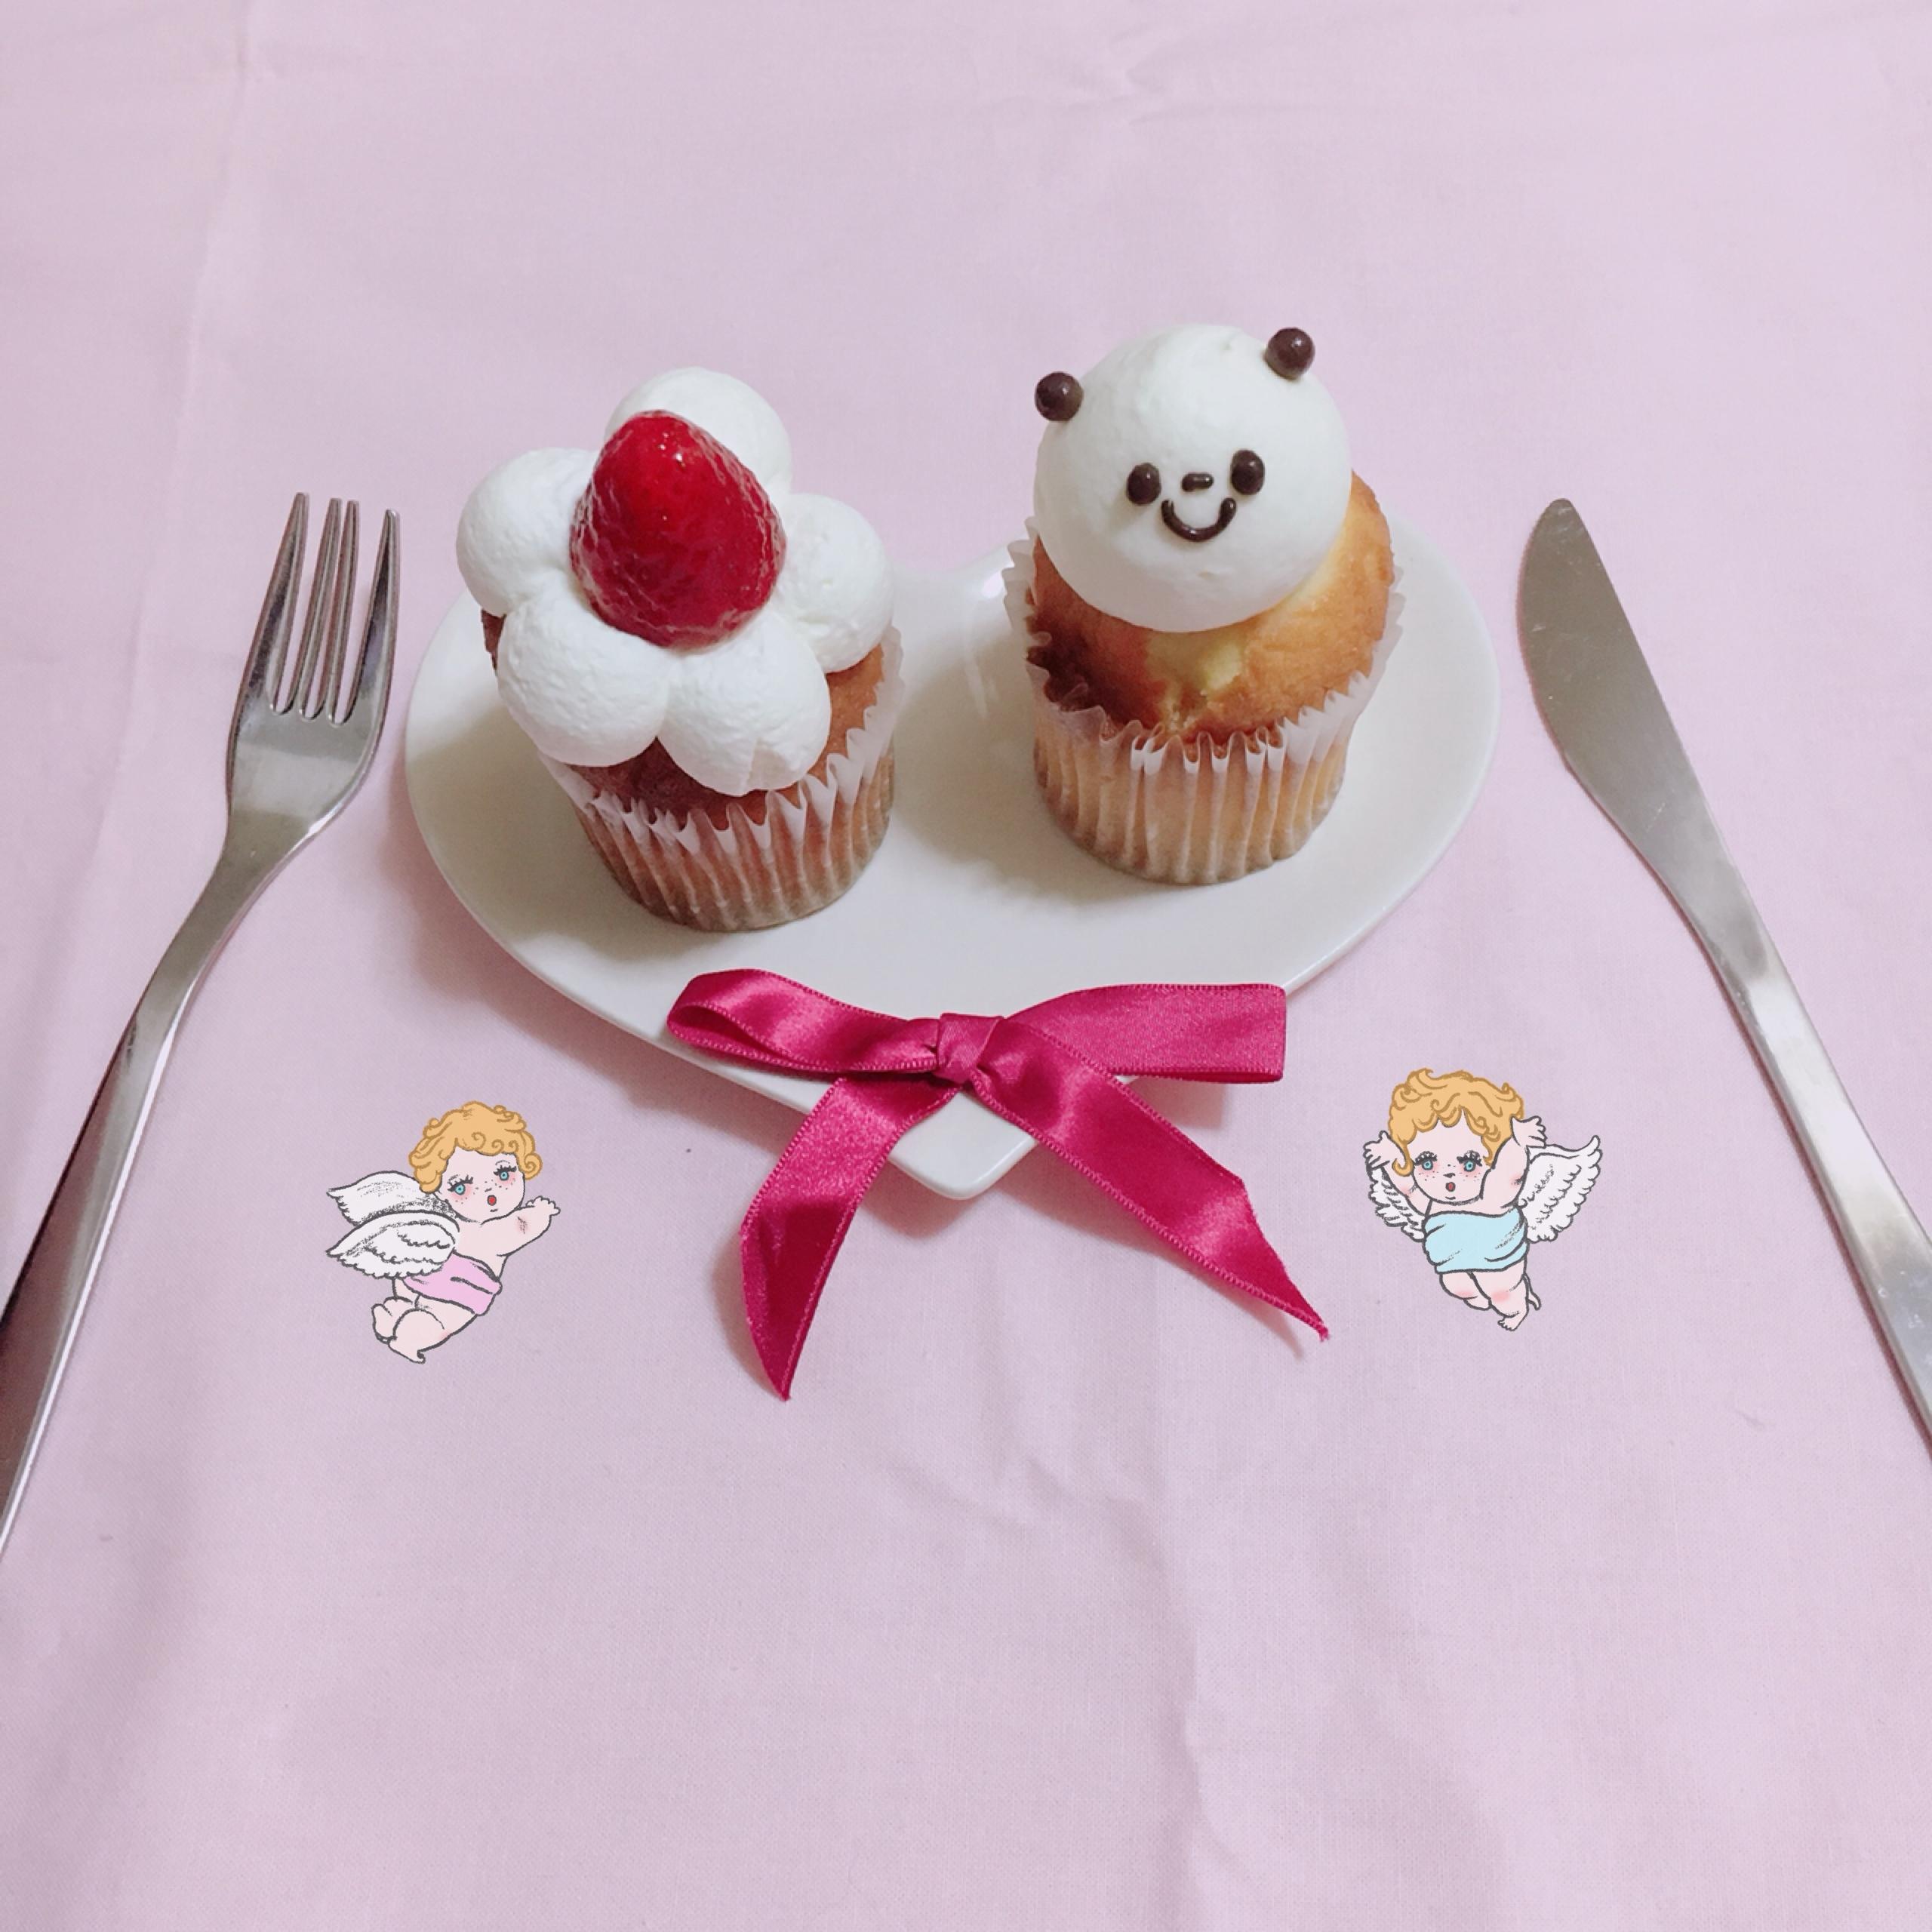 ^o^第72回【可愛くて美味しい❤︎】fairycake fairのカップケーキ!_1_1